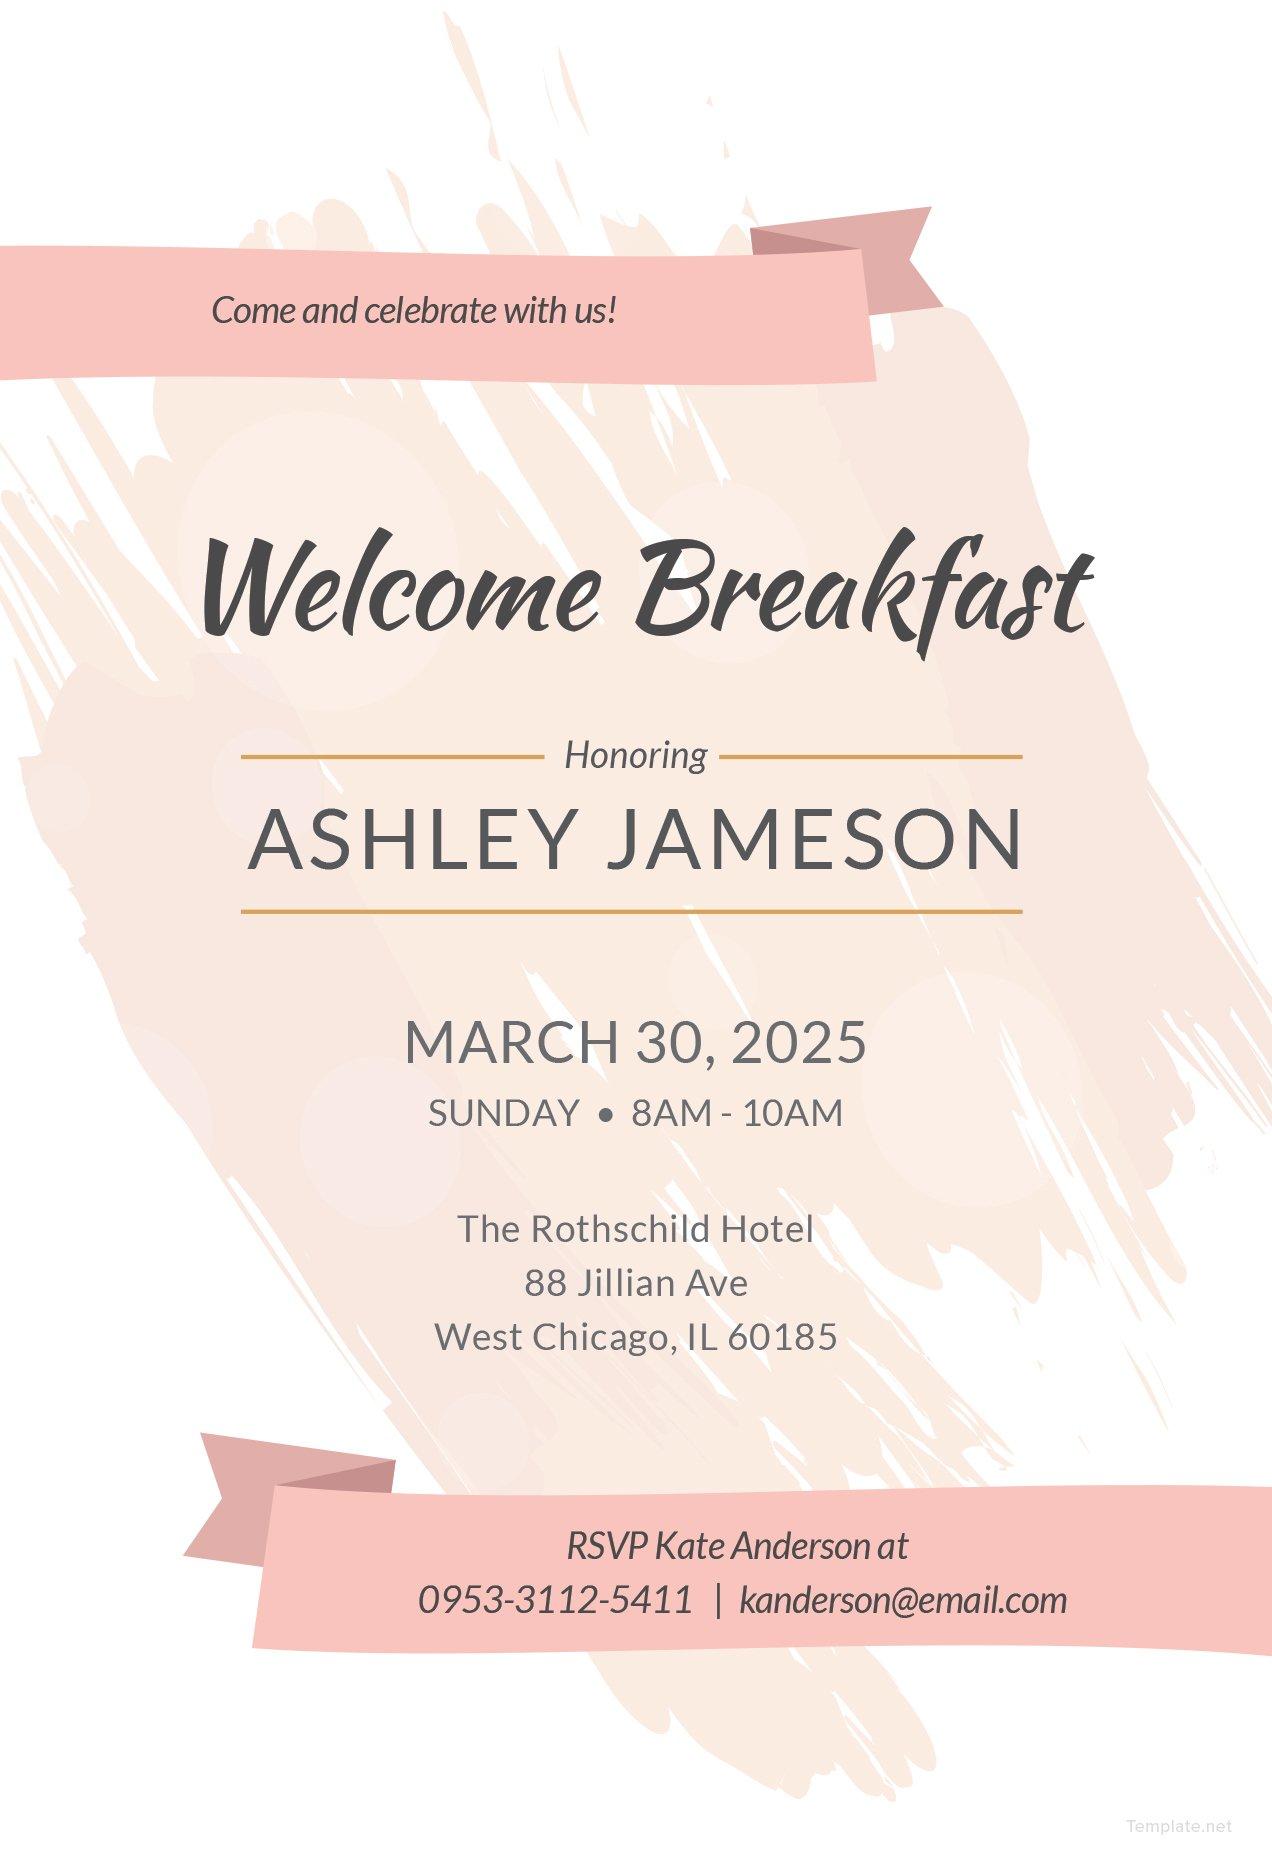 free welcome breakfast invitation template in adobe illustrator